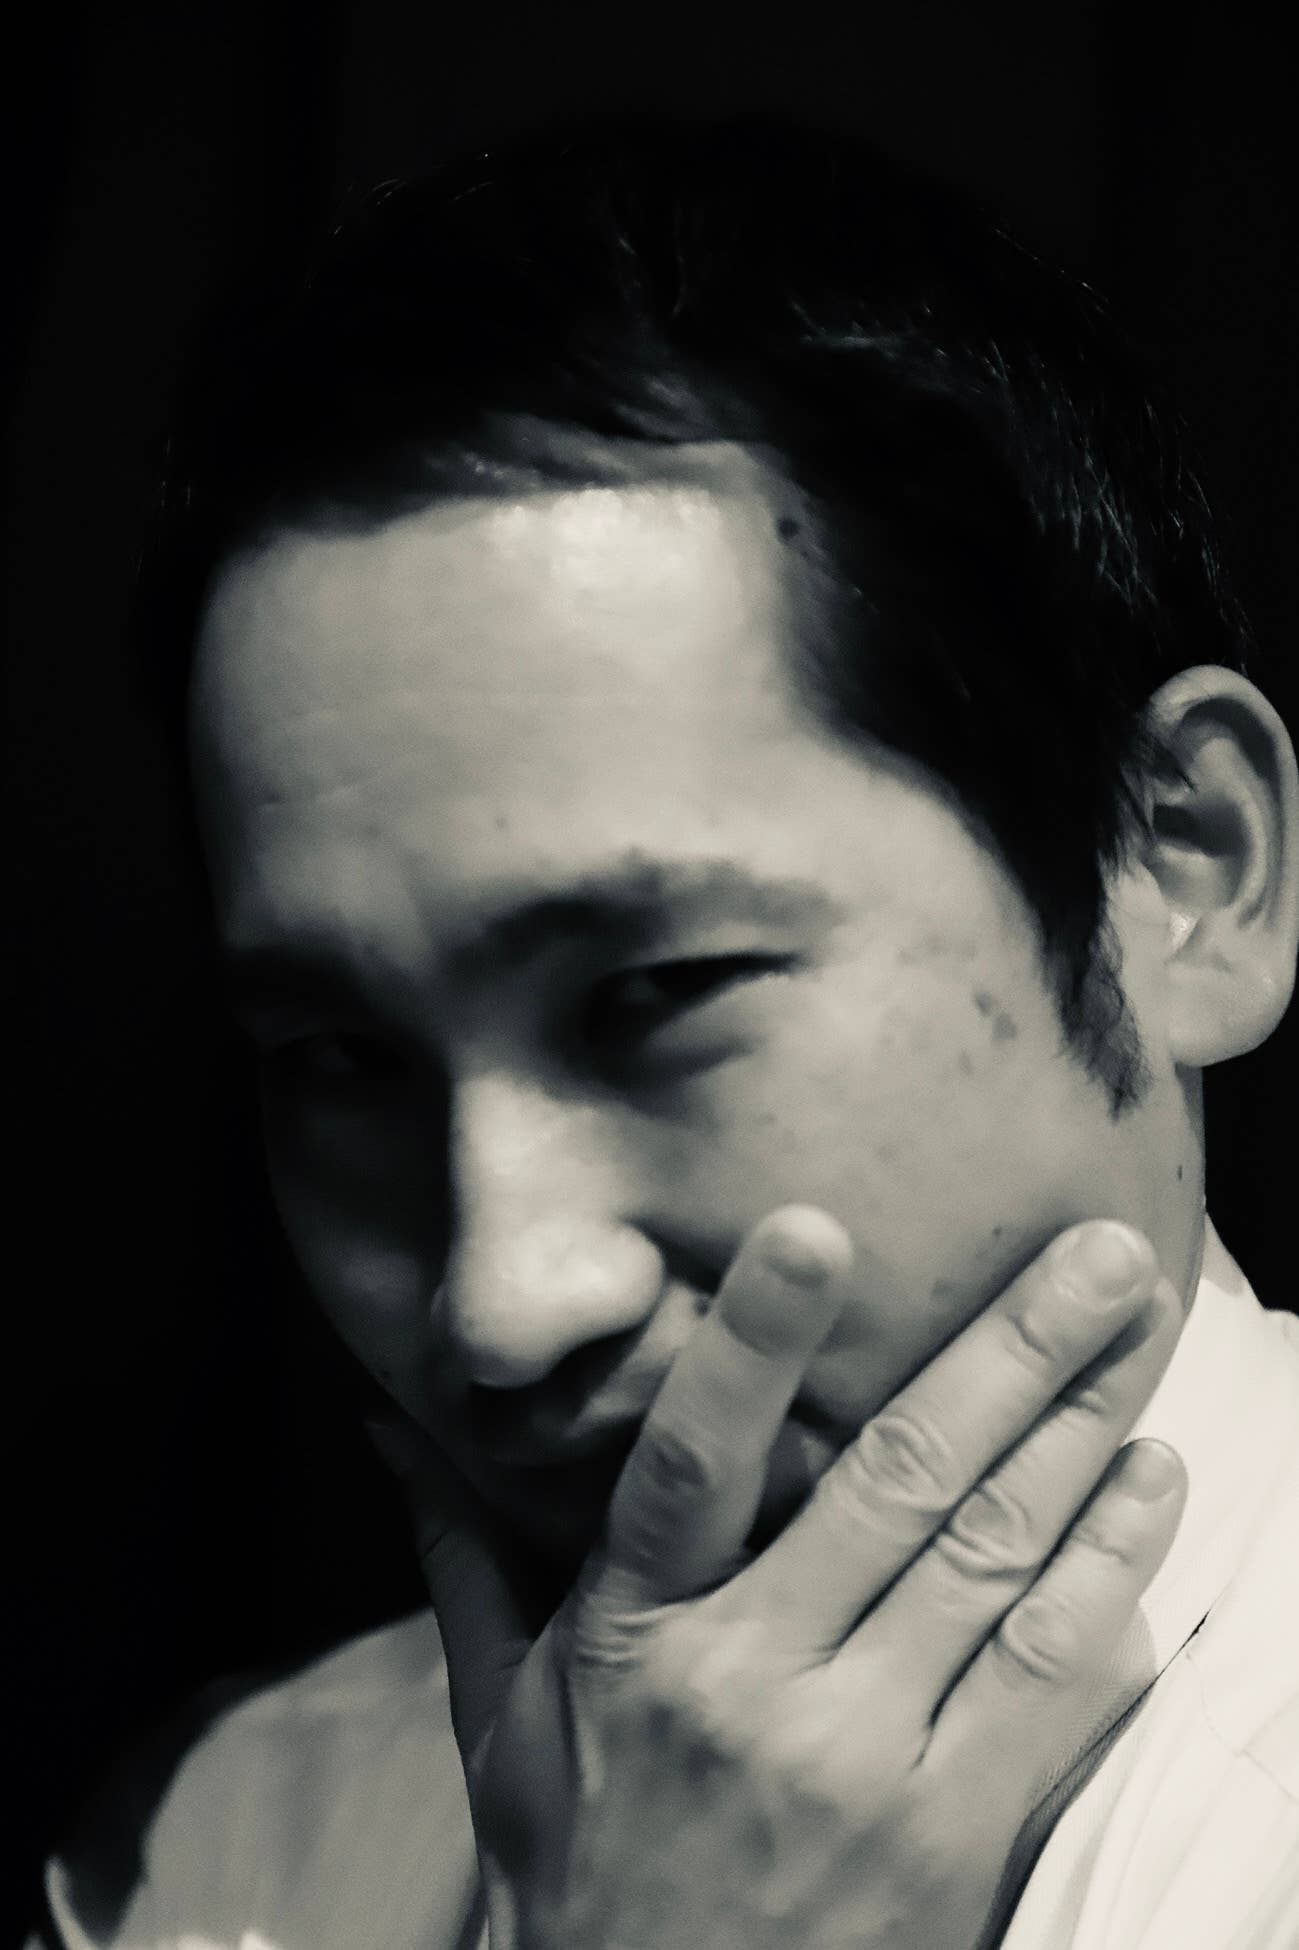 Kenta Kawashima